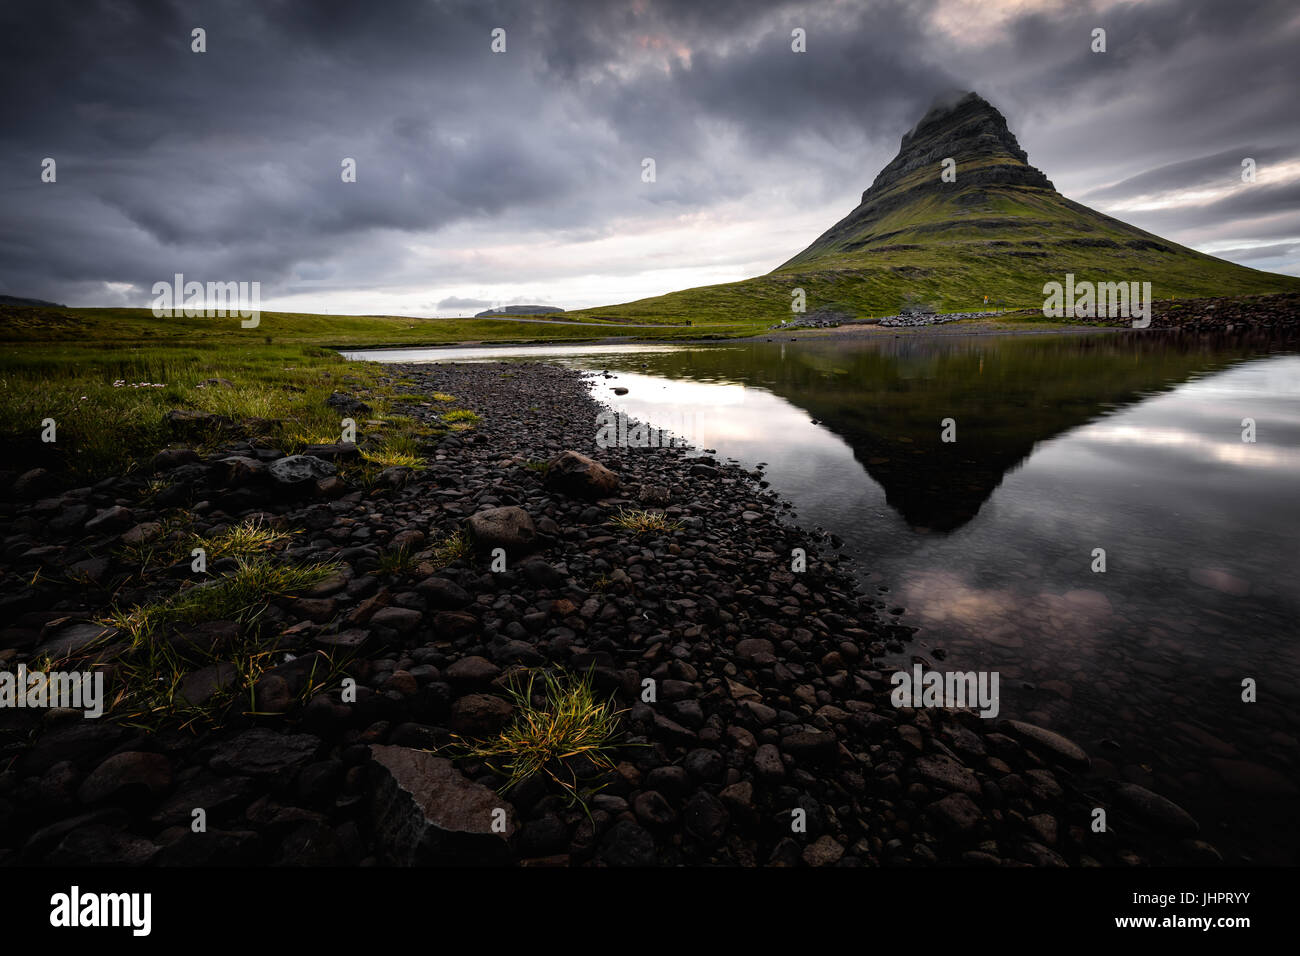 Kirkjufell in Iceland - Stock Image